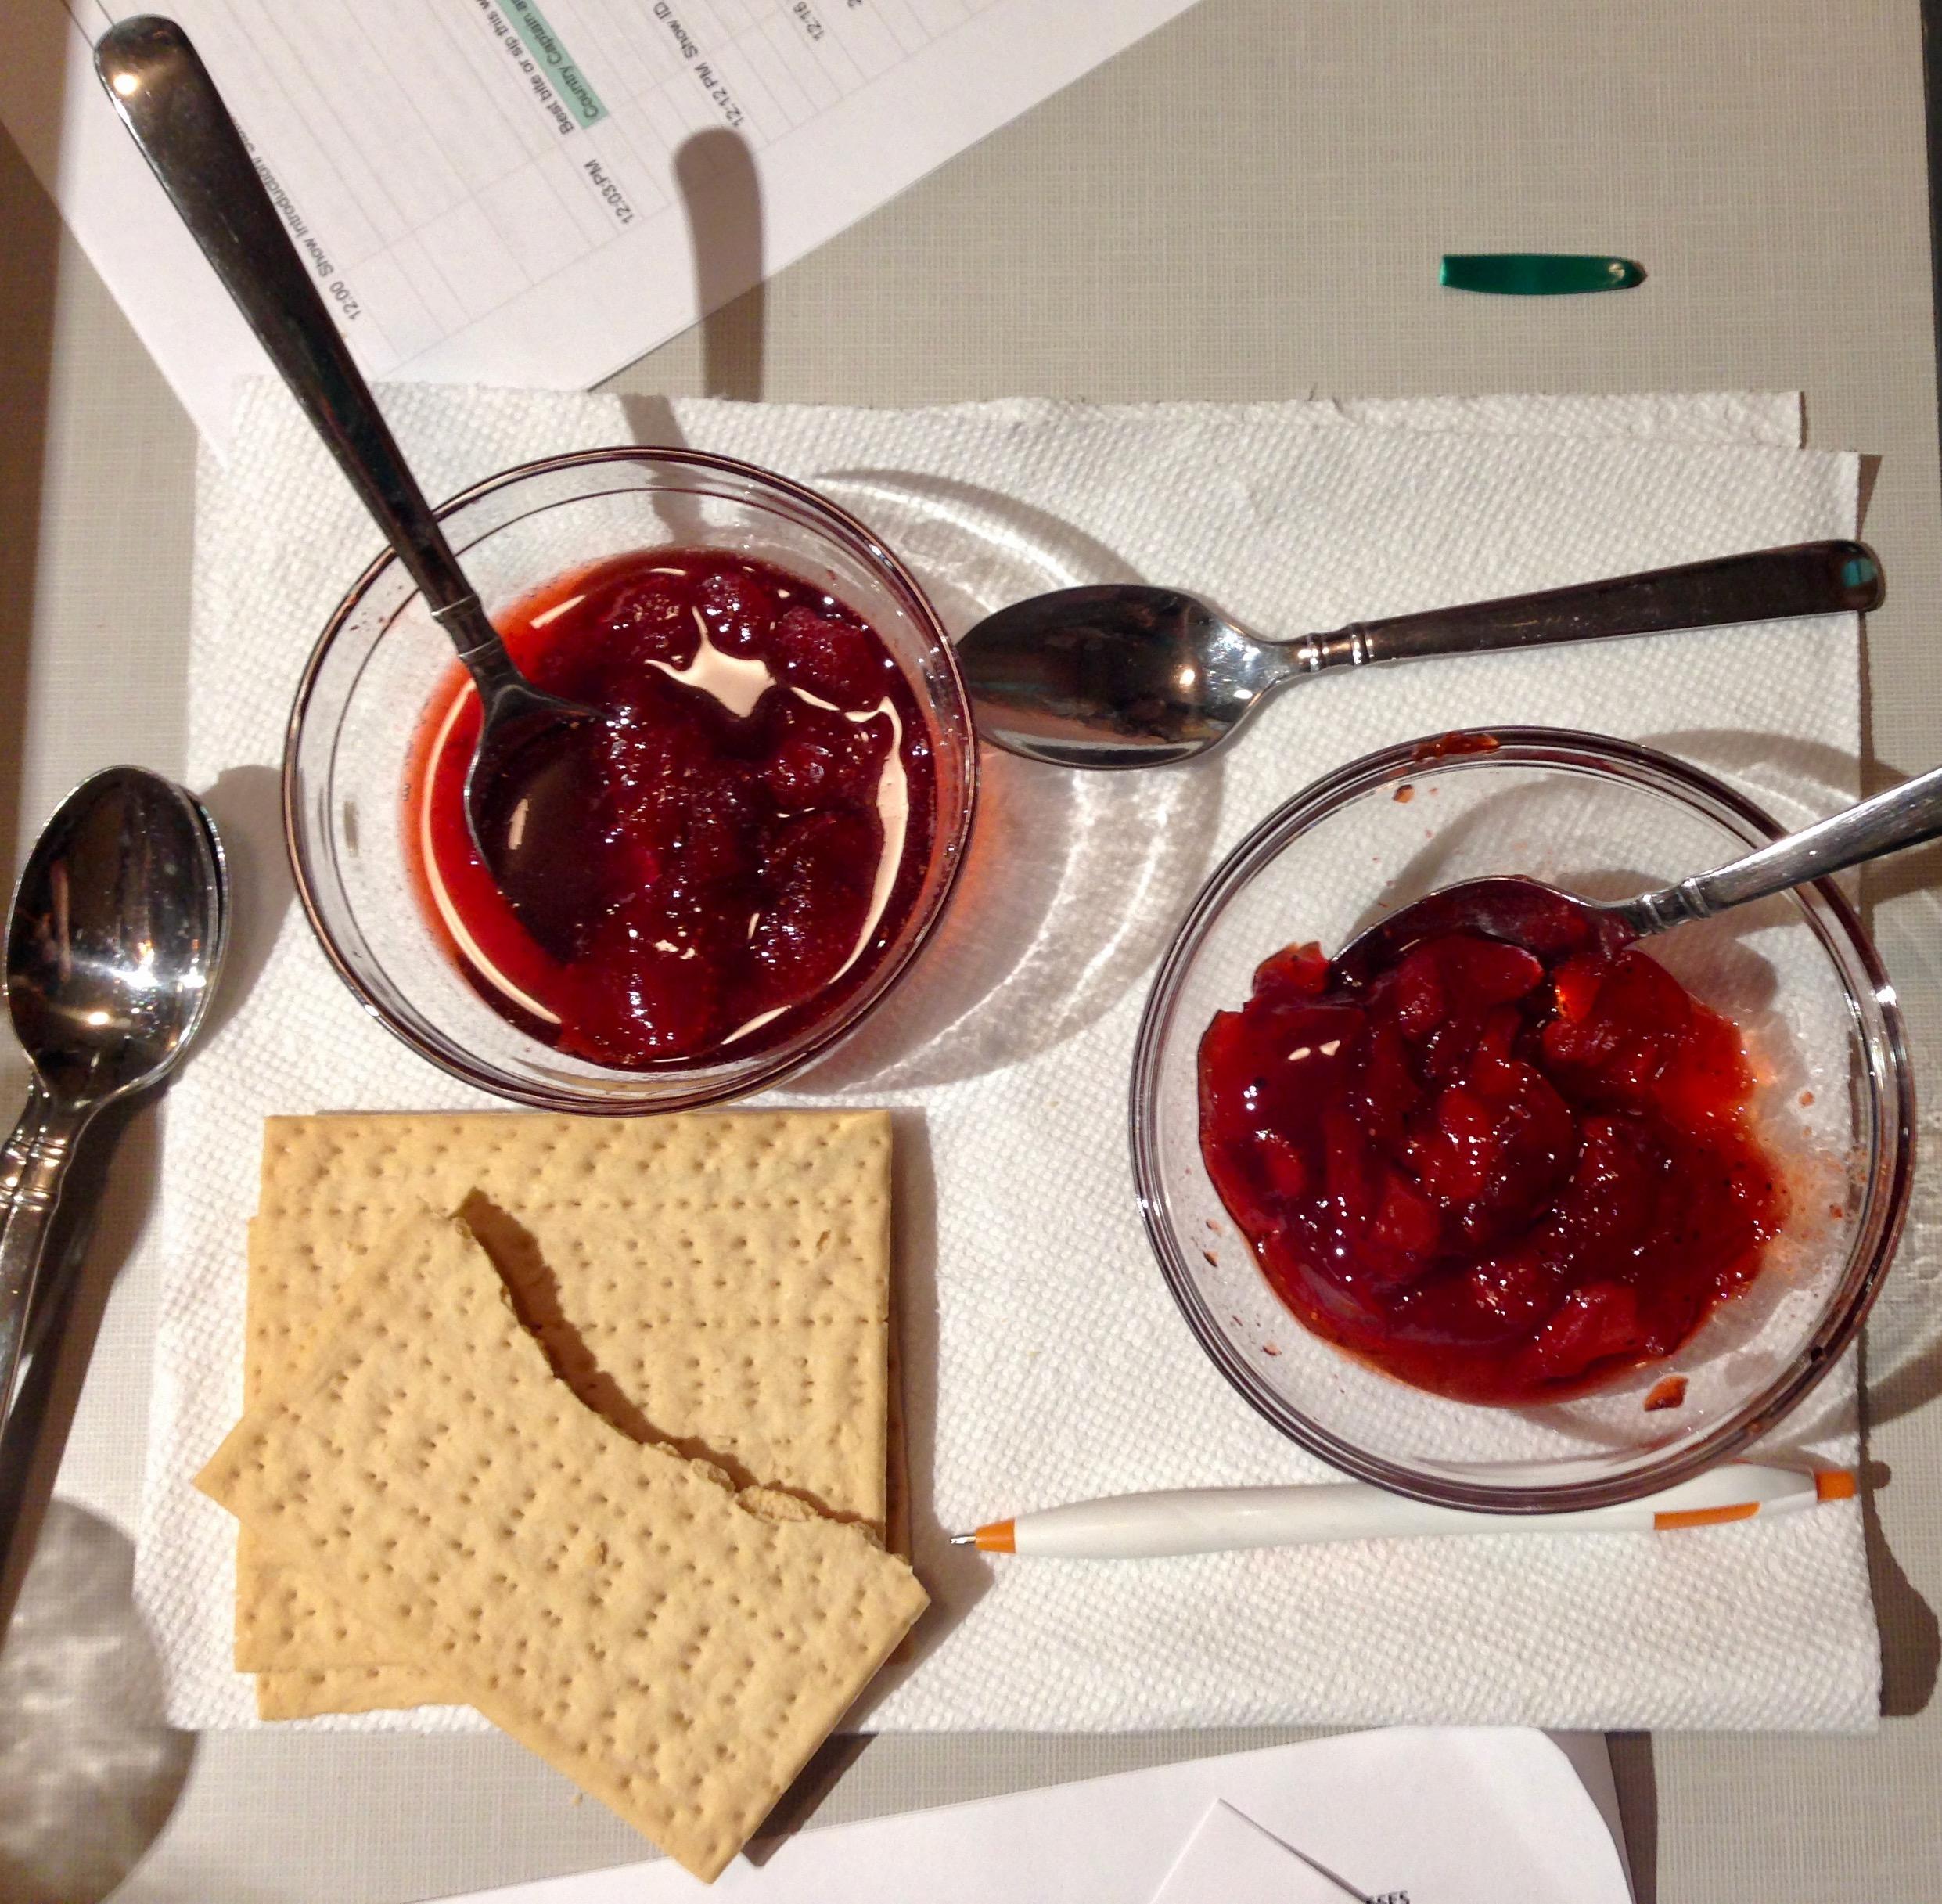 Tasting traditional Strawberry Preserves and Strawberry Balsamic Black Pepper Jam in the studios at WLXU-LP FM, 93.9,  Lexington Community Radio .